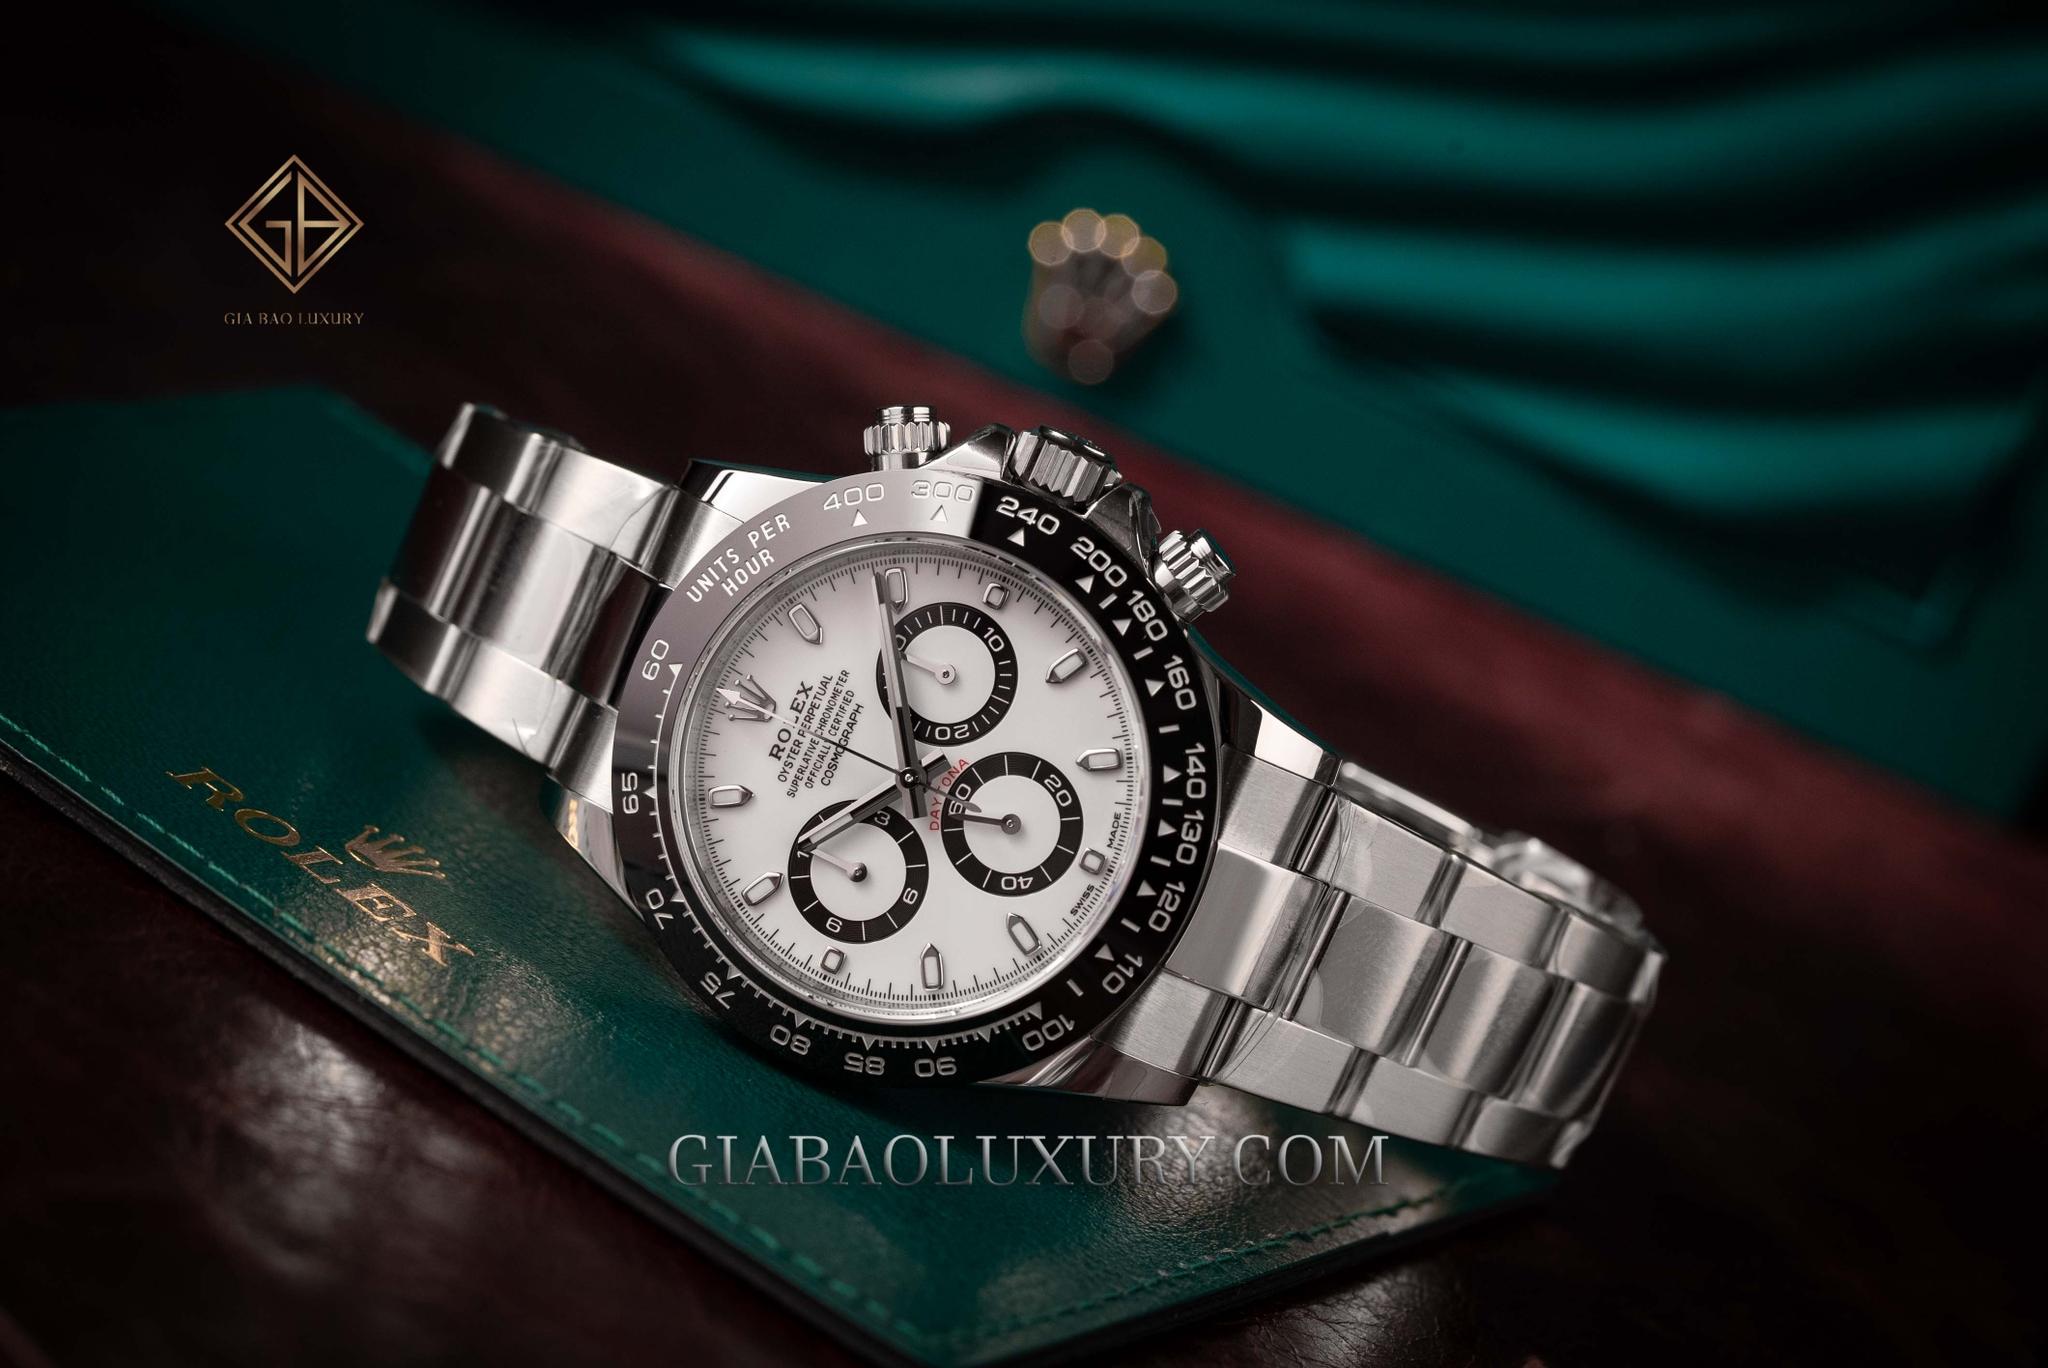 Đồng Hồ Rolex Cosmograph Daytona 116500LN Mặt Số Trắng